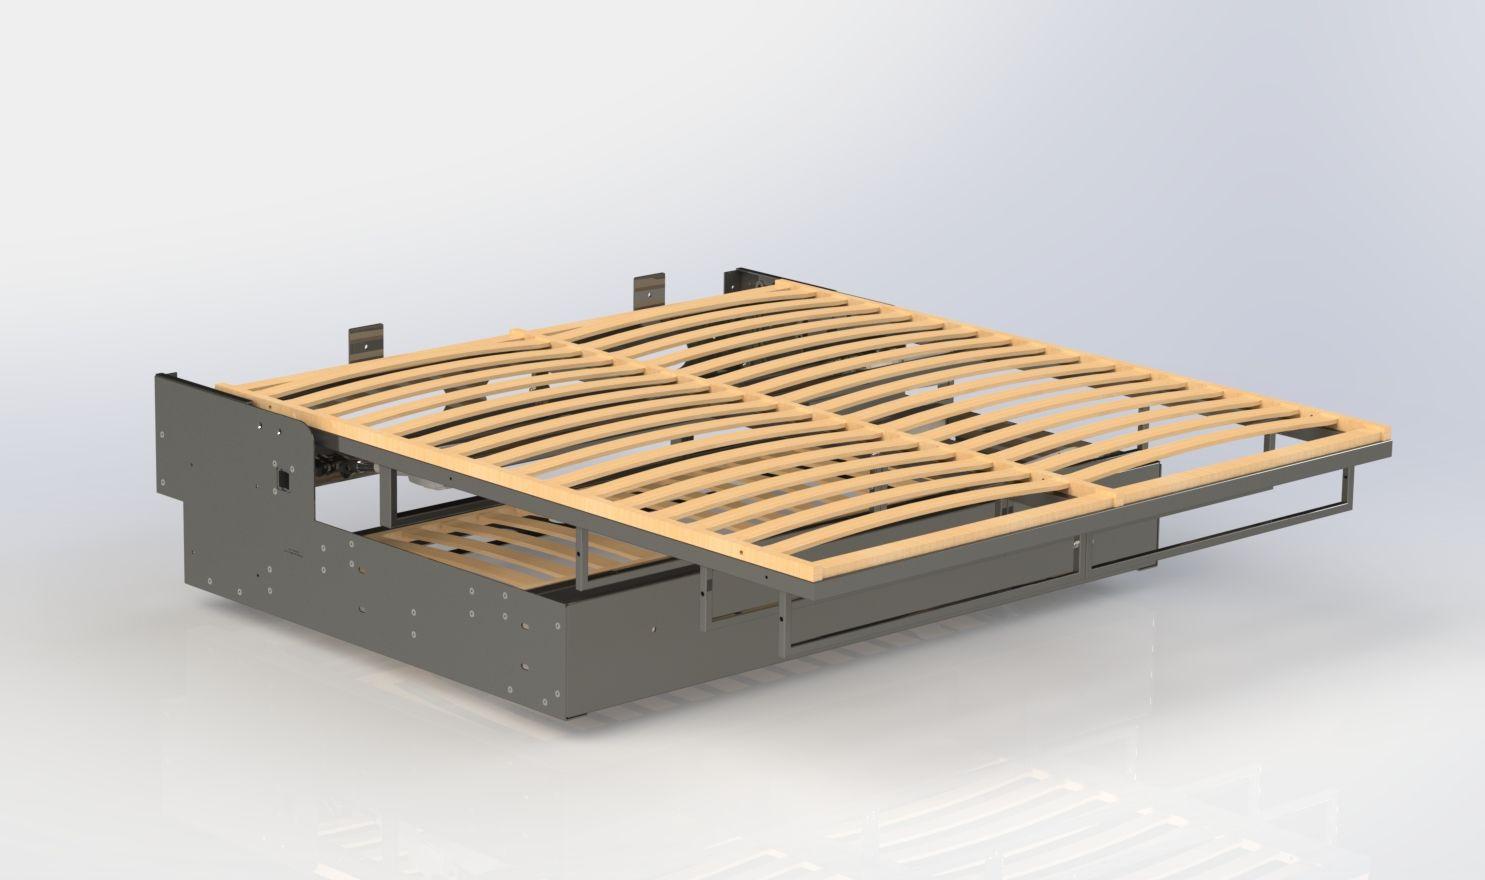 Modulierbares Sofa Bett Modern Holz Hybride Liftsecurity